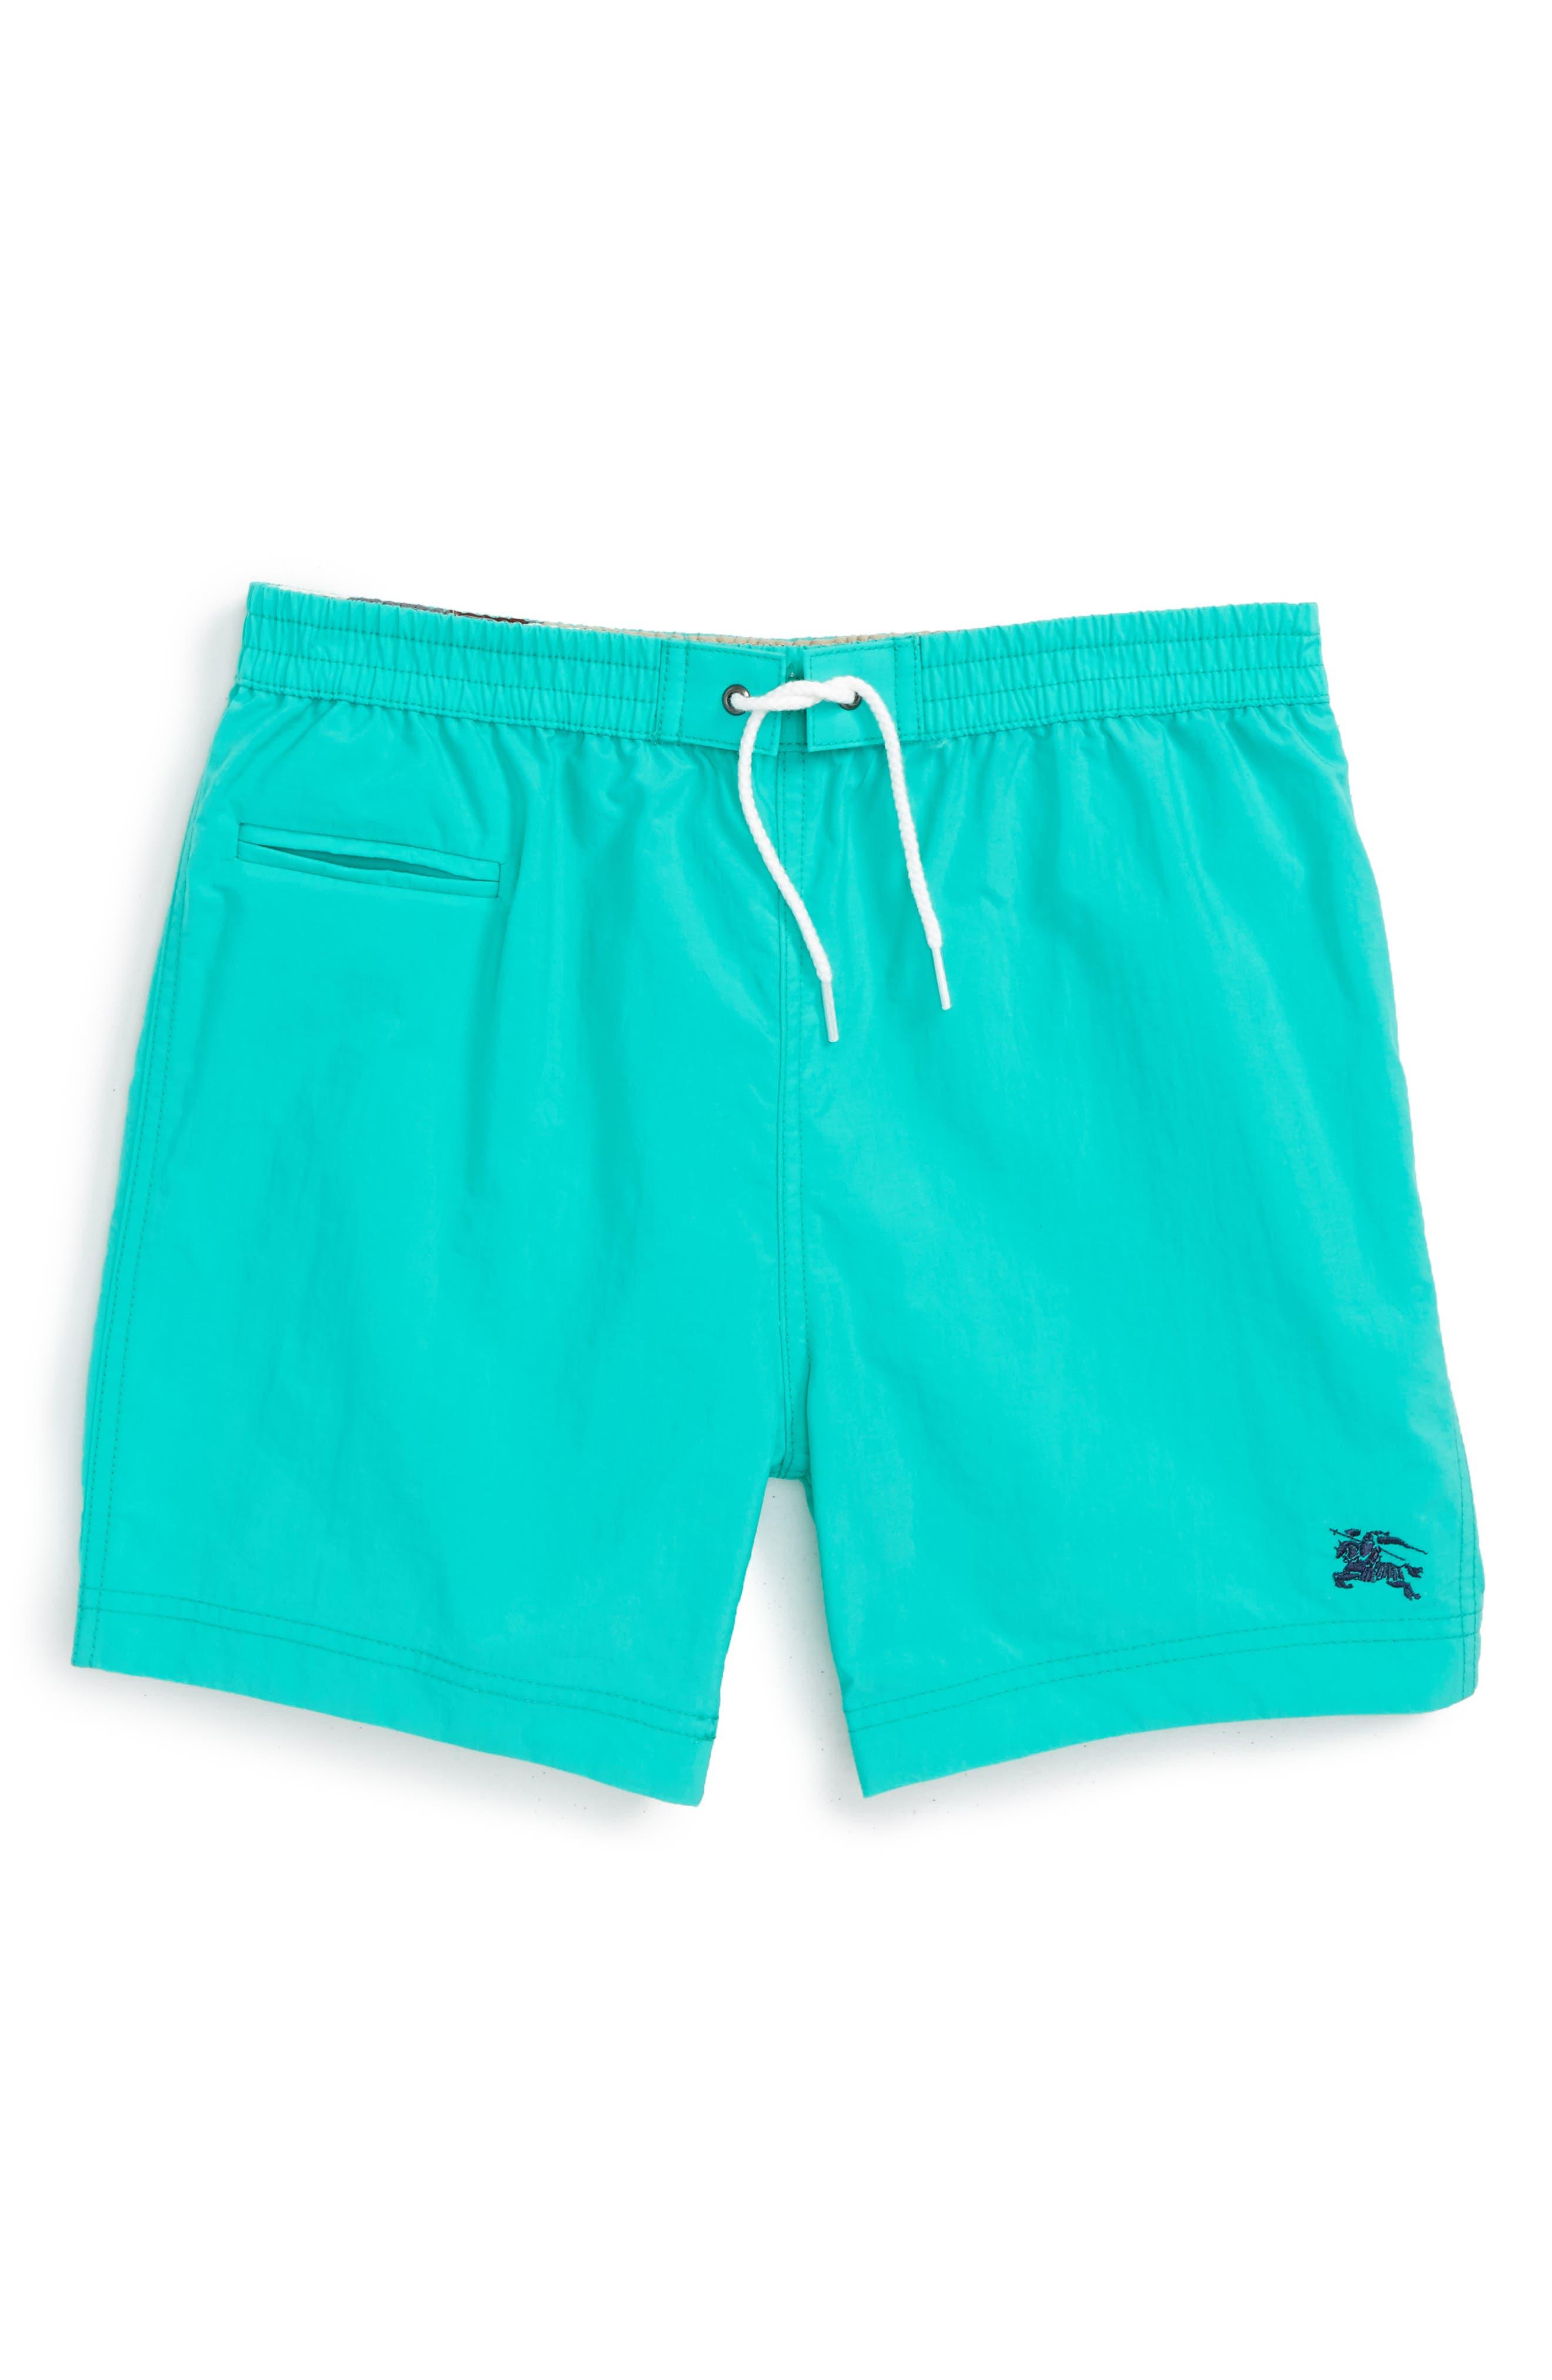 Mini Galvin Swim Trunks,                         Main,                         color, 325